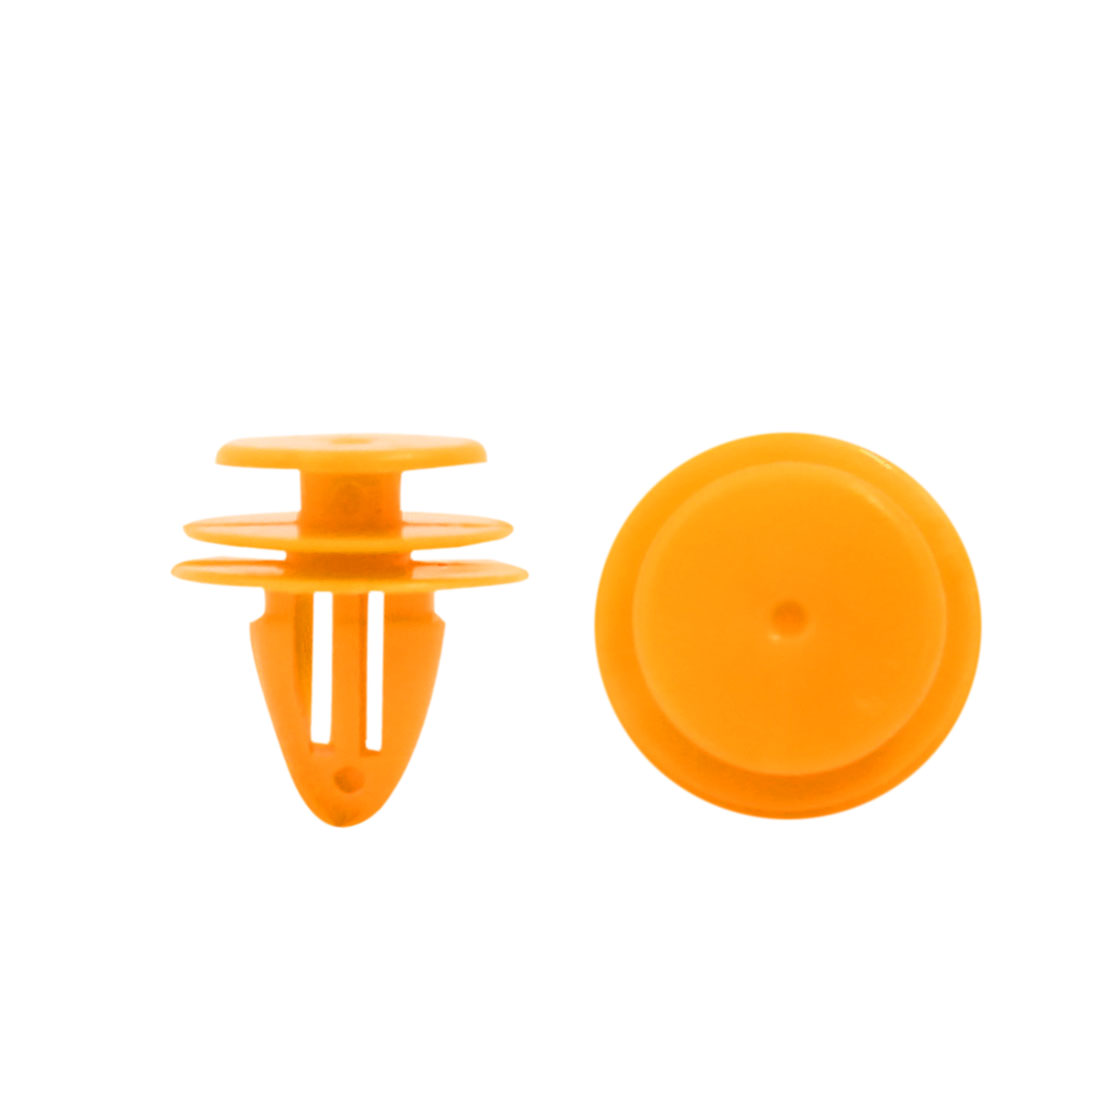 40Pcs Yellow Plastic Rivets Fastener Retainer Splash Guard Moulding Clips 9mm